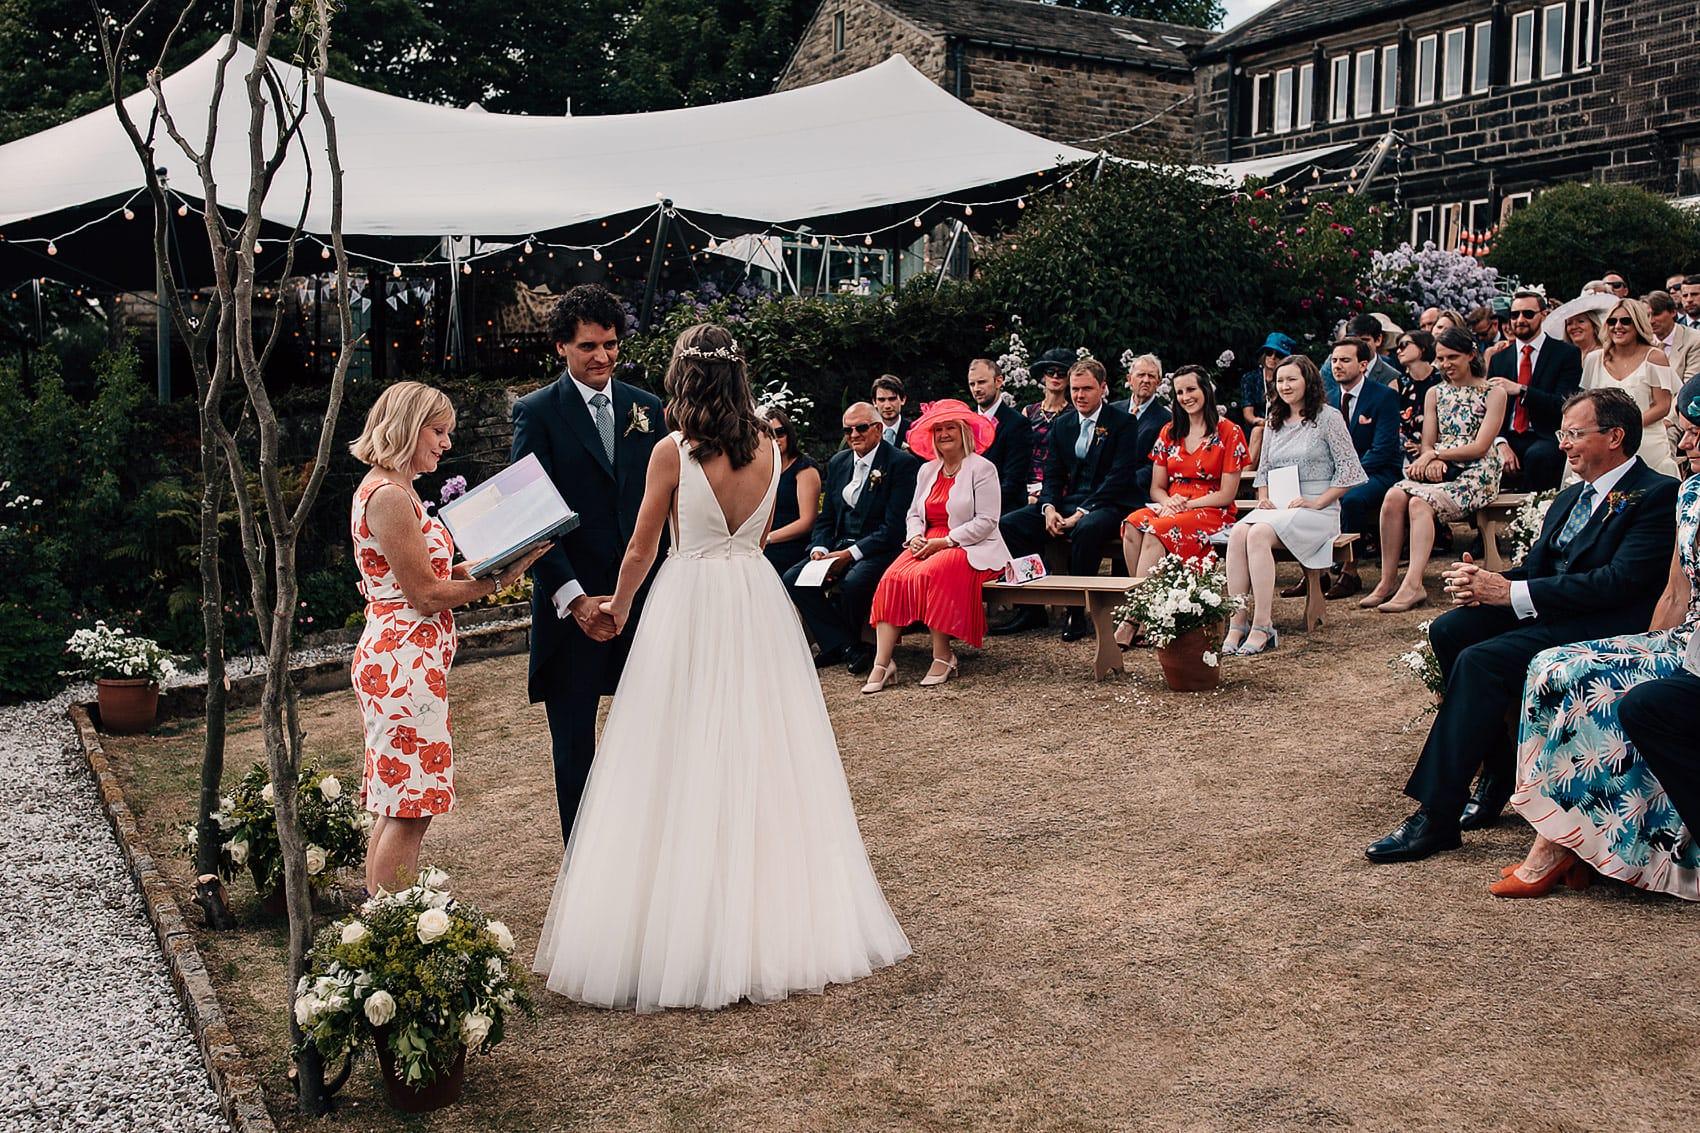 backless wedding dress outdoor wedding